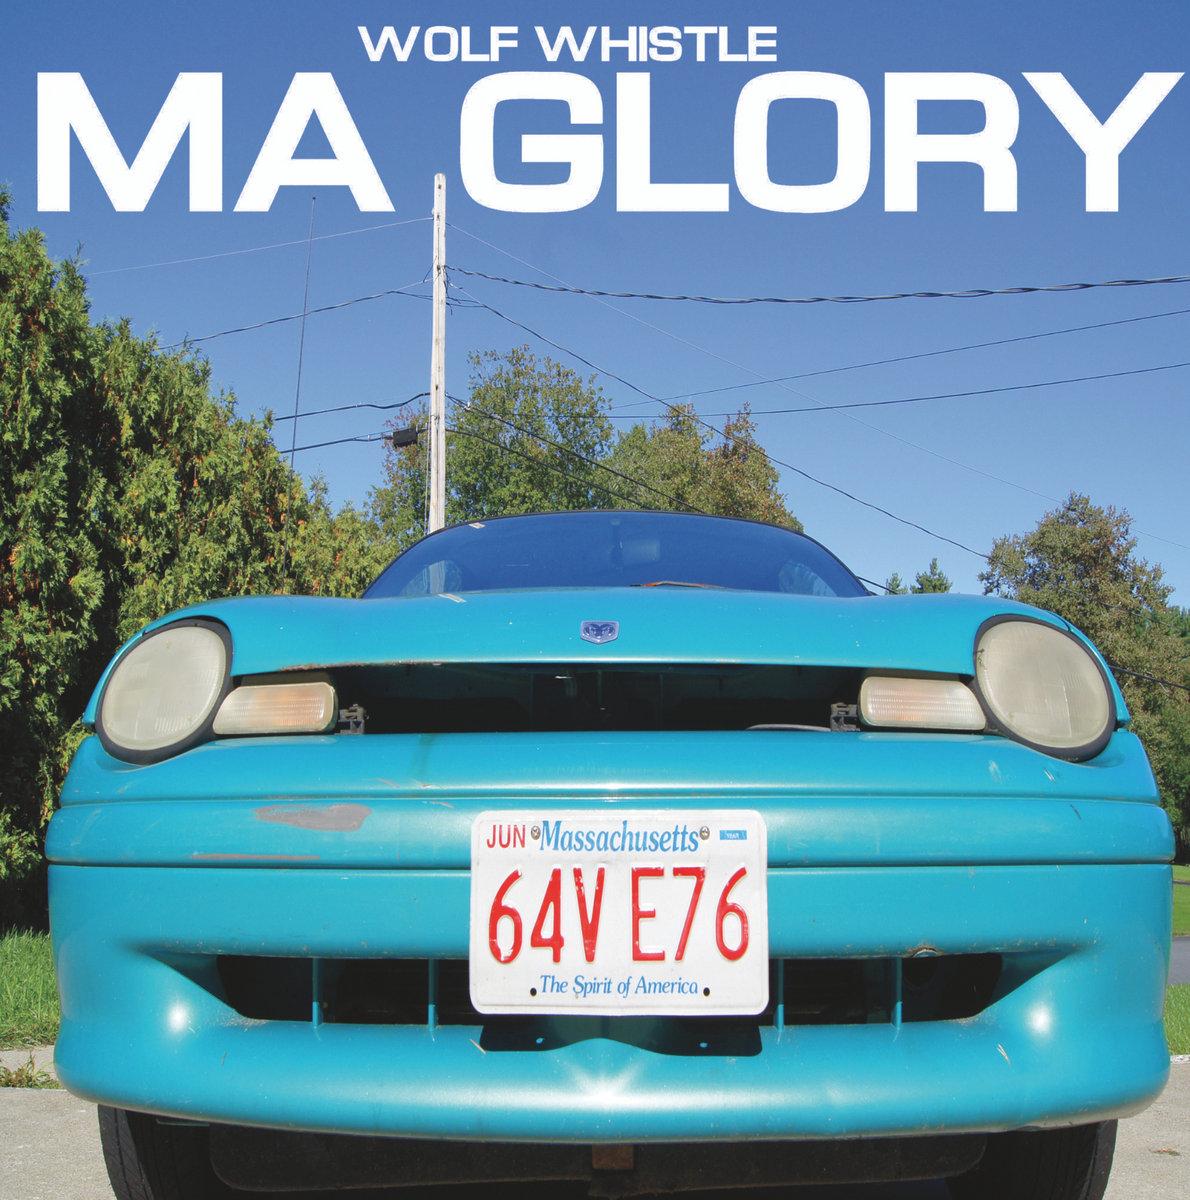 Ma Glory Wolf Whistle